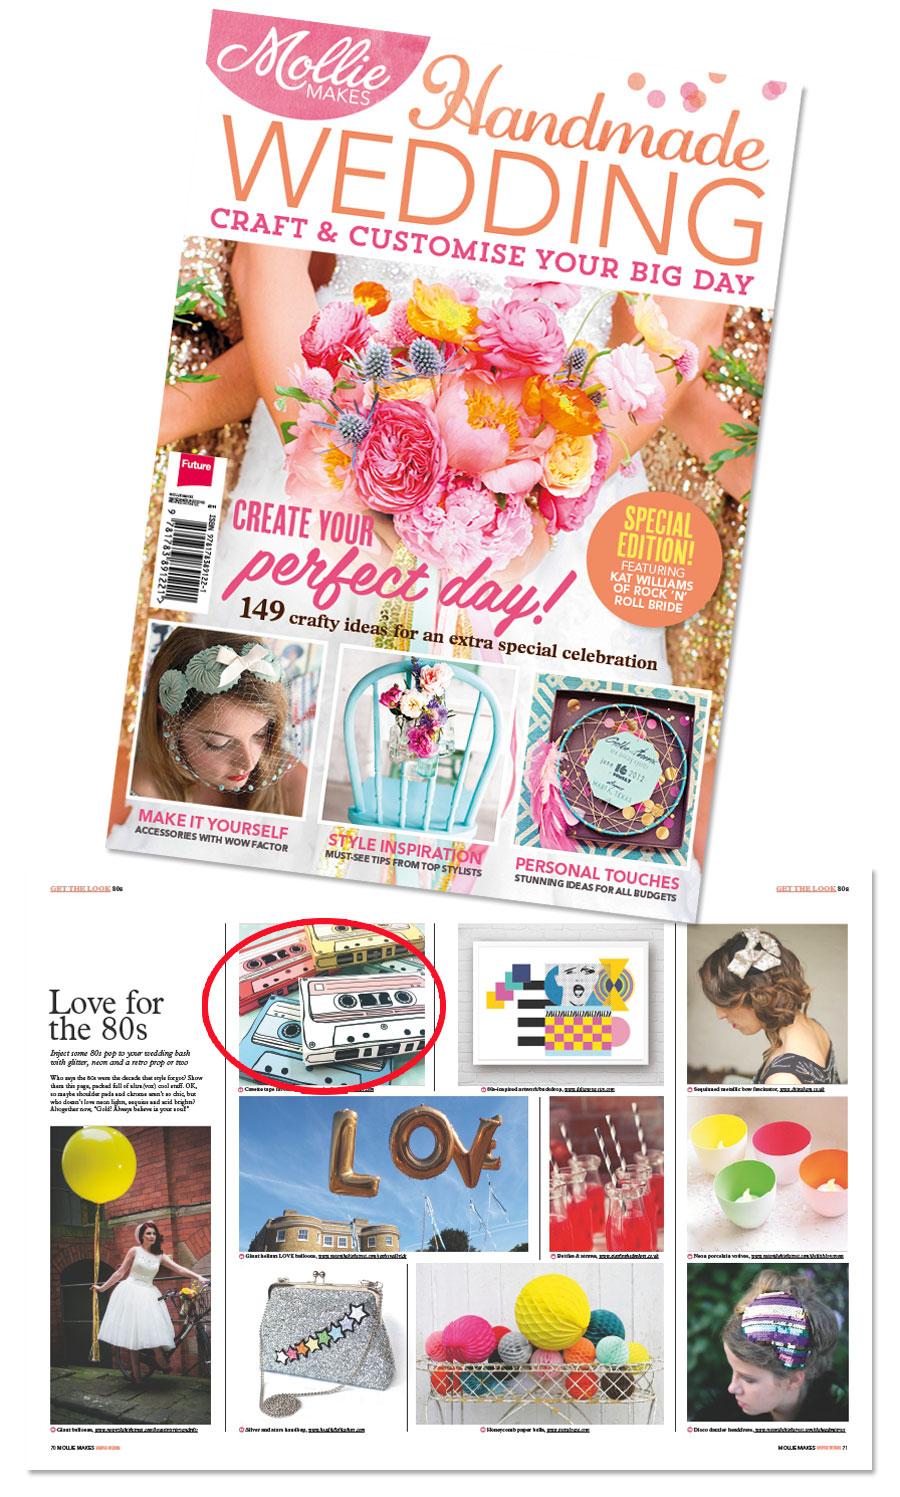 http://1.bp.blogspot.com/-ymvHn8v45mU/U7RIL8YmeLI/AAAAAAAAD7Q/tTqpNvwF4os/s1600/mollie_makes_wedding_issue.jpg